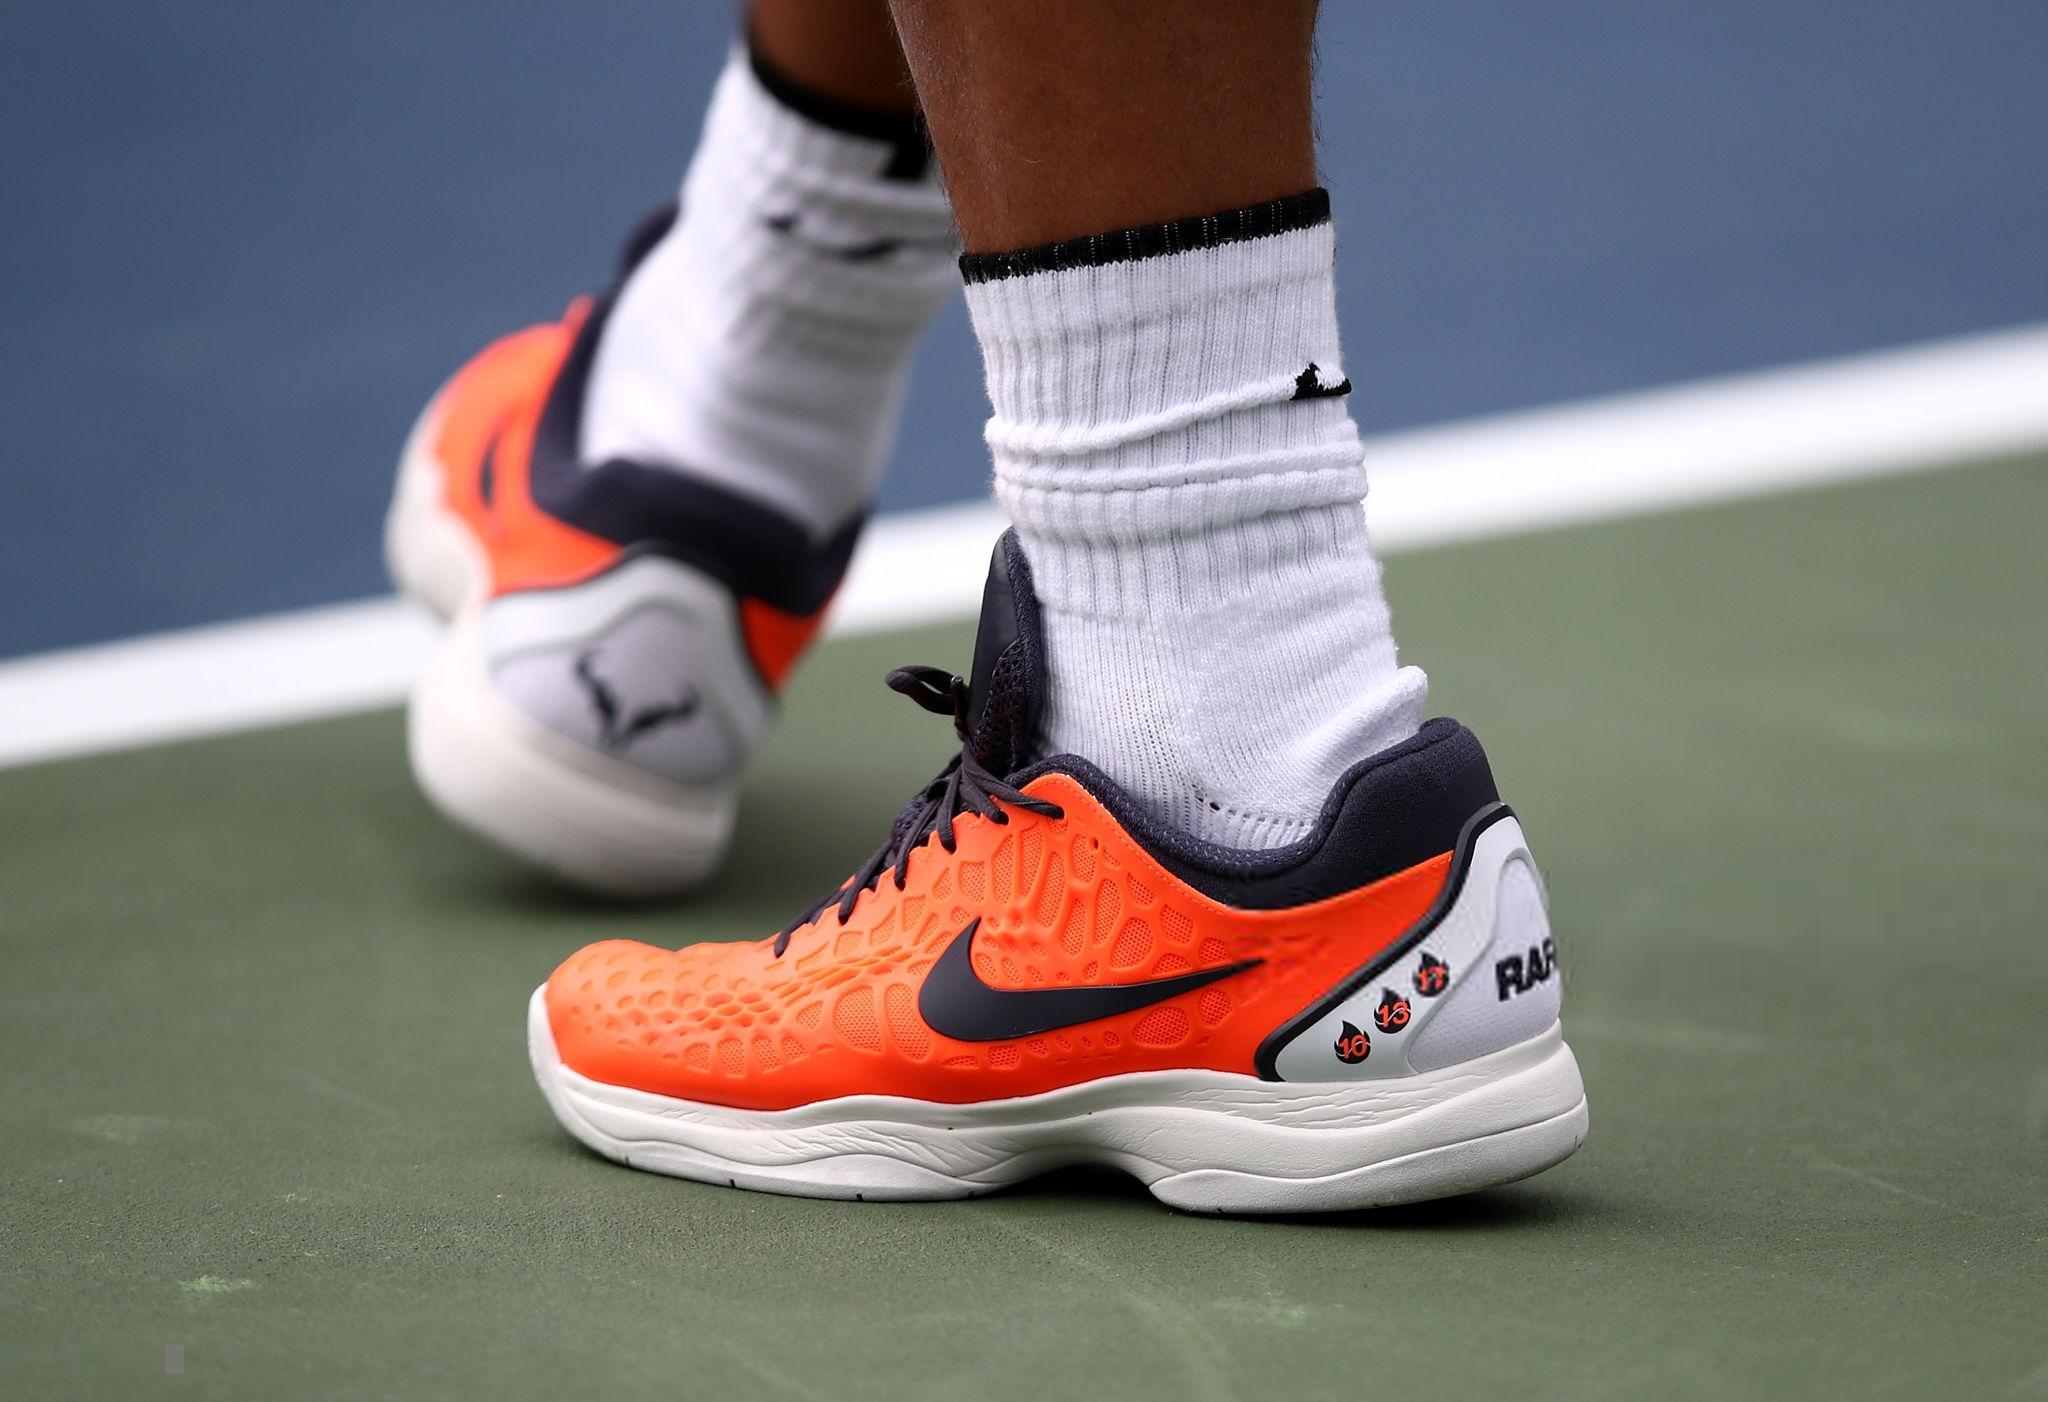 2018 Nike Rafael Us Open Nadal Shoes – Fans TJF1lKc